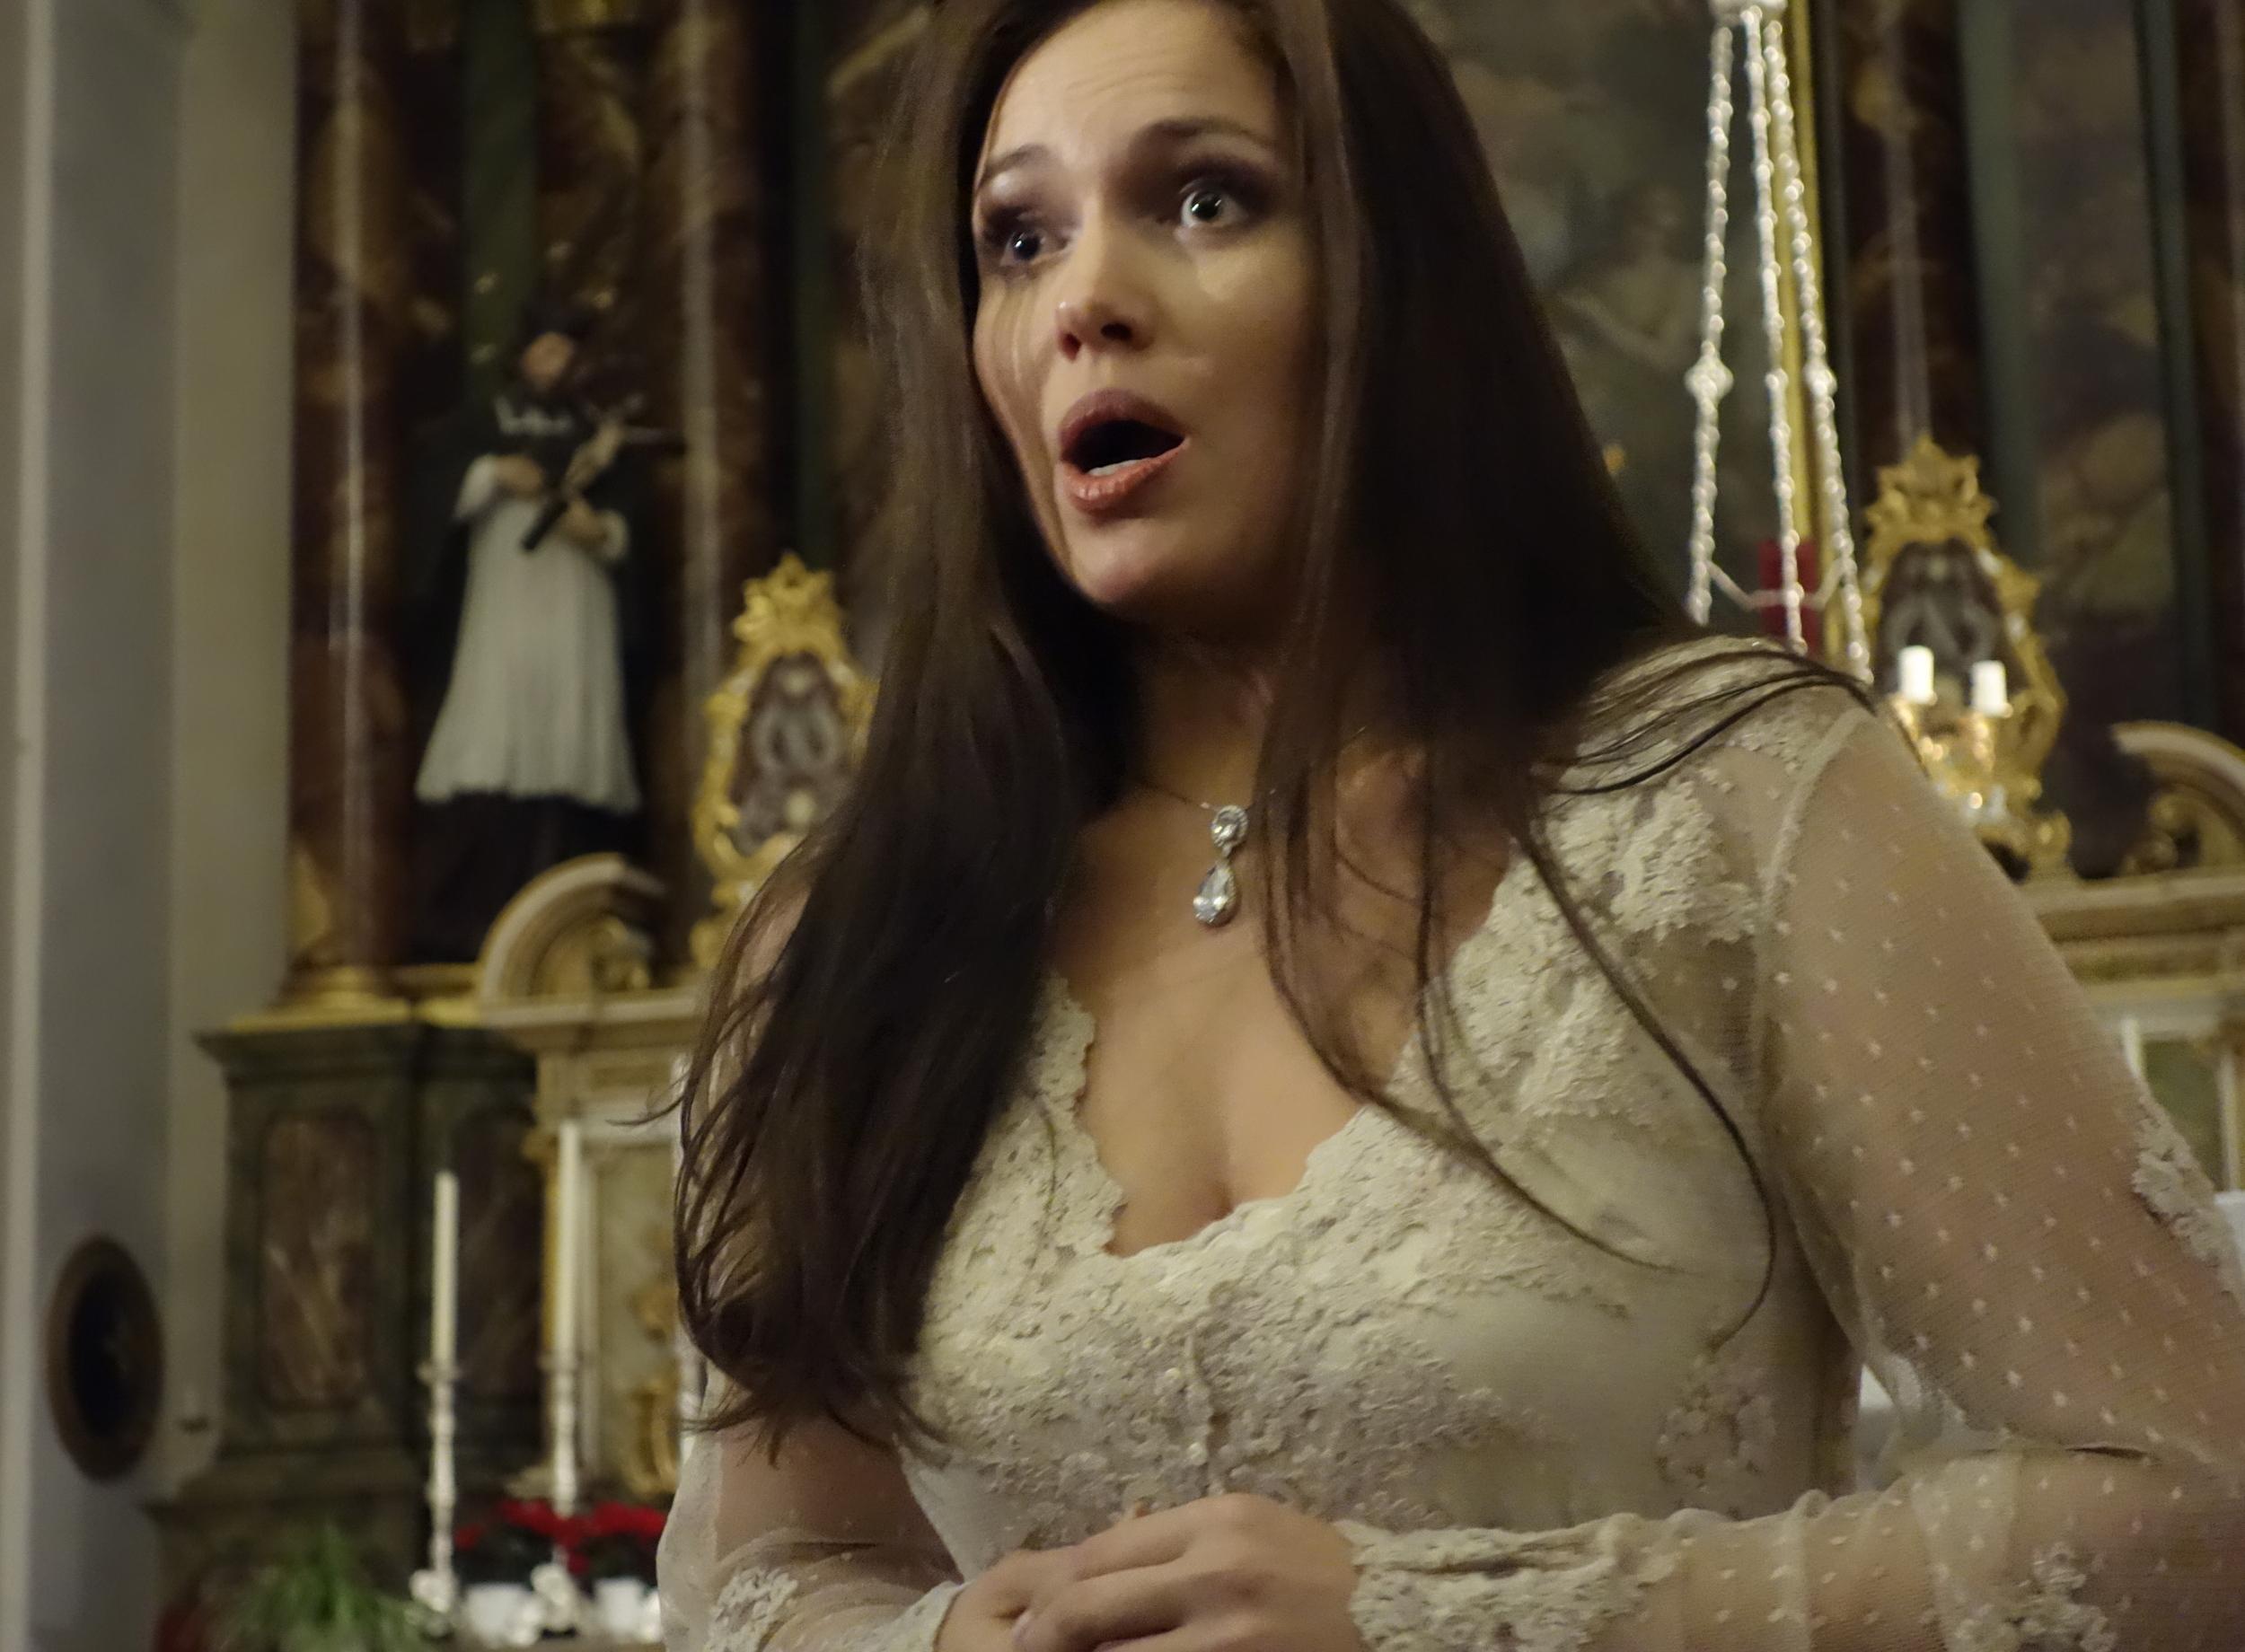 Maria Bayankina, soprano, Mariinsky Opera-2013-07-18 22.14.36-1.jpg